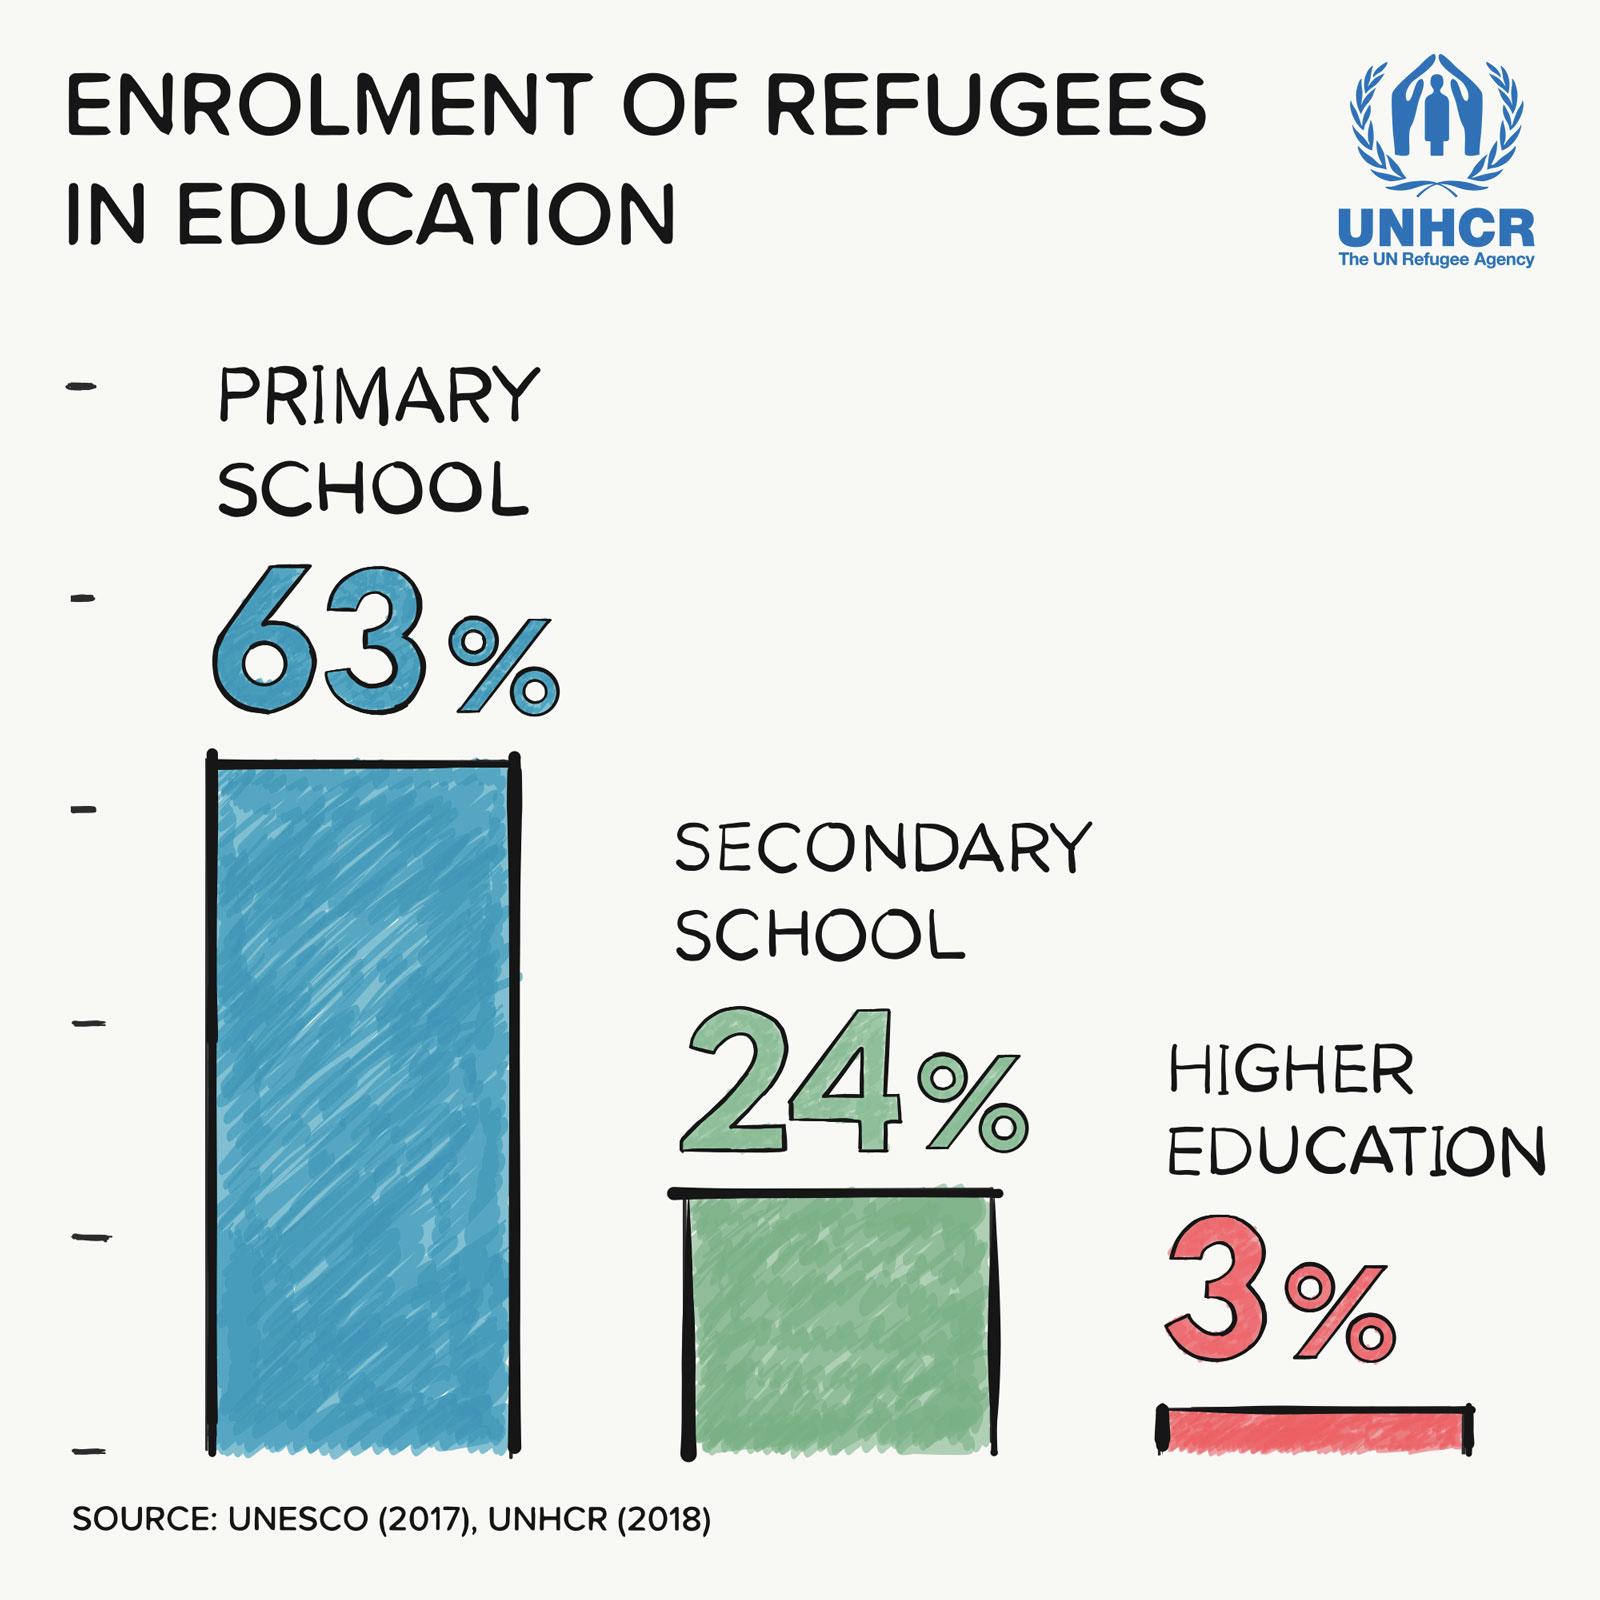 Enrollment of refugees in education